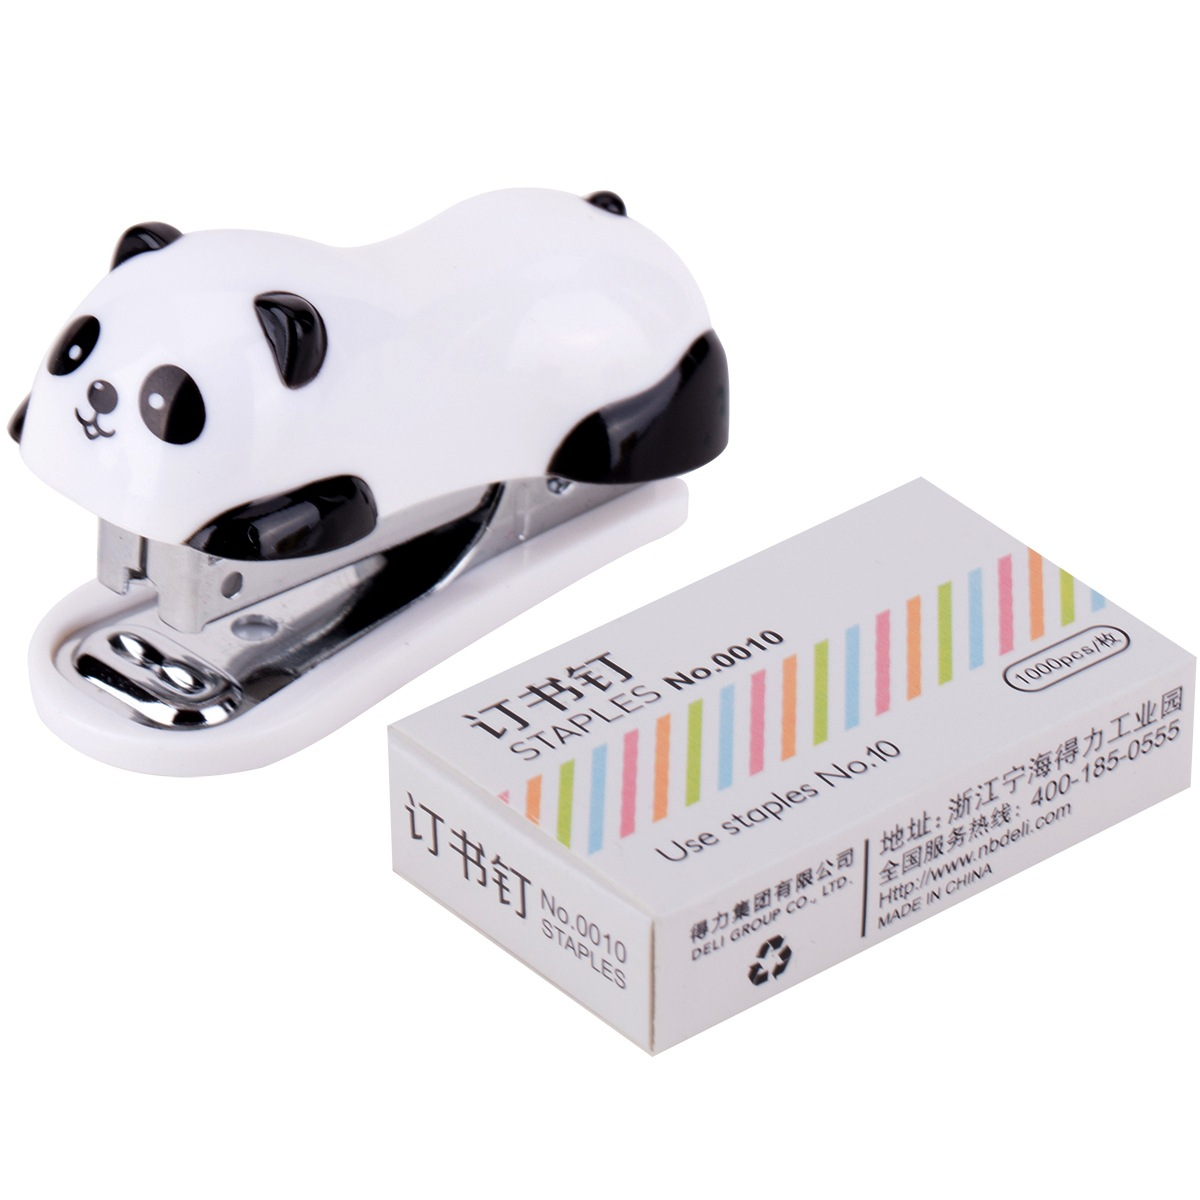 Cute Little Animals Panda Stapler Set Escolar Papelaria School Office Supply Student Prize Birthday Gift